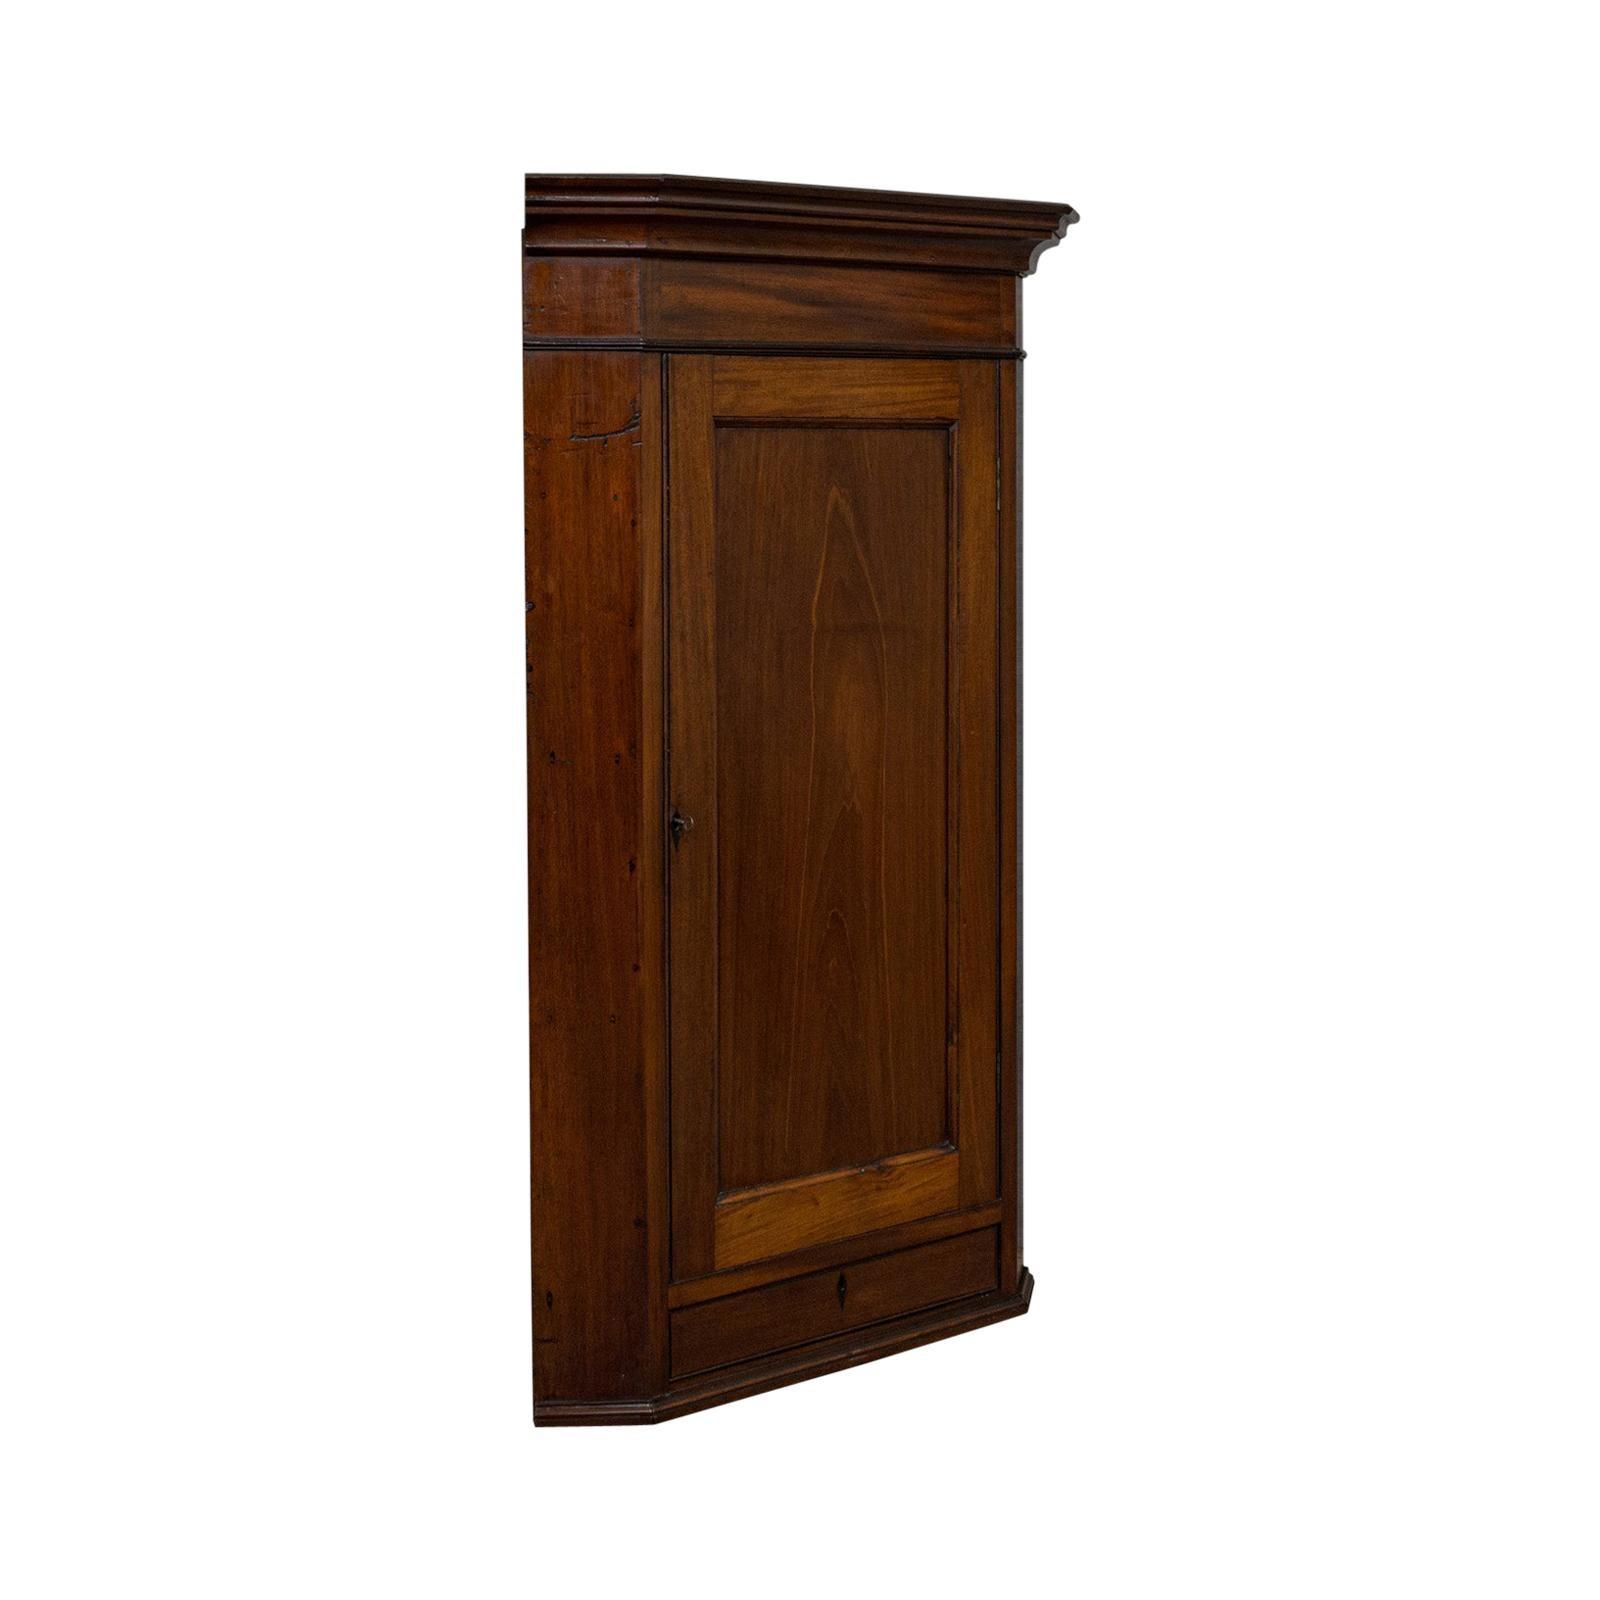 Antique Corner Cabinet, English, Walnut, Mahogany, Wall, Cupboard, Georgian